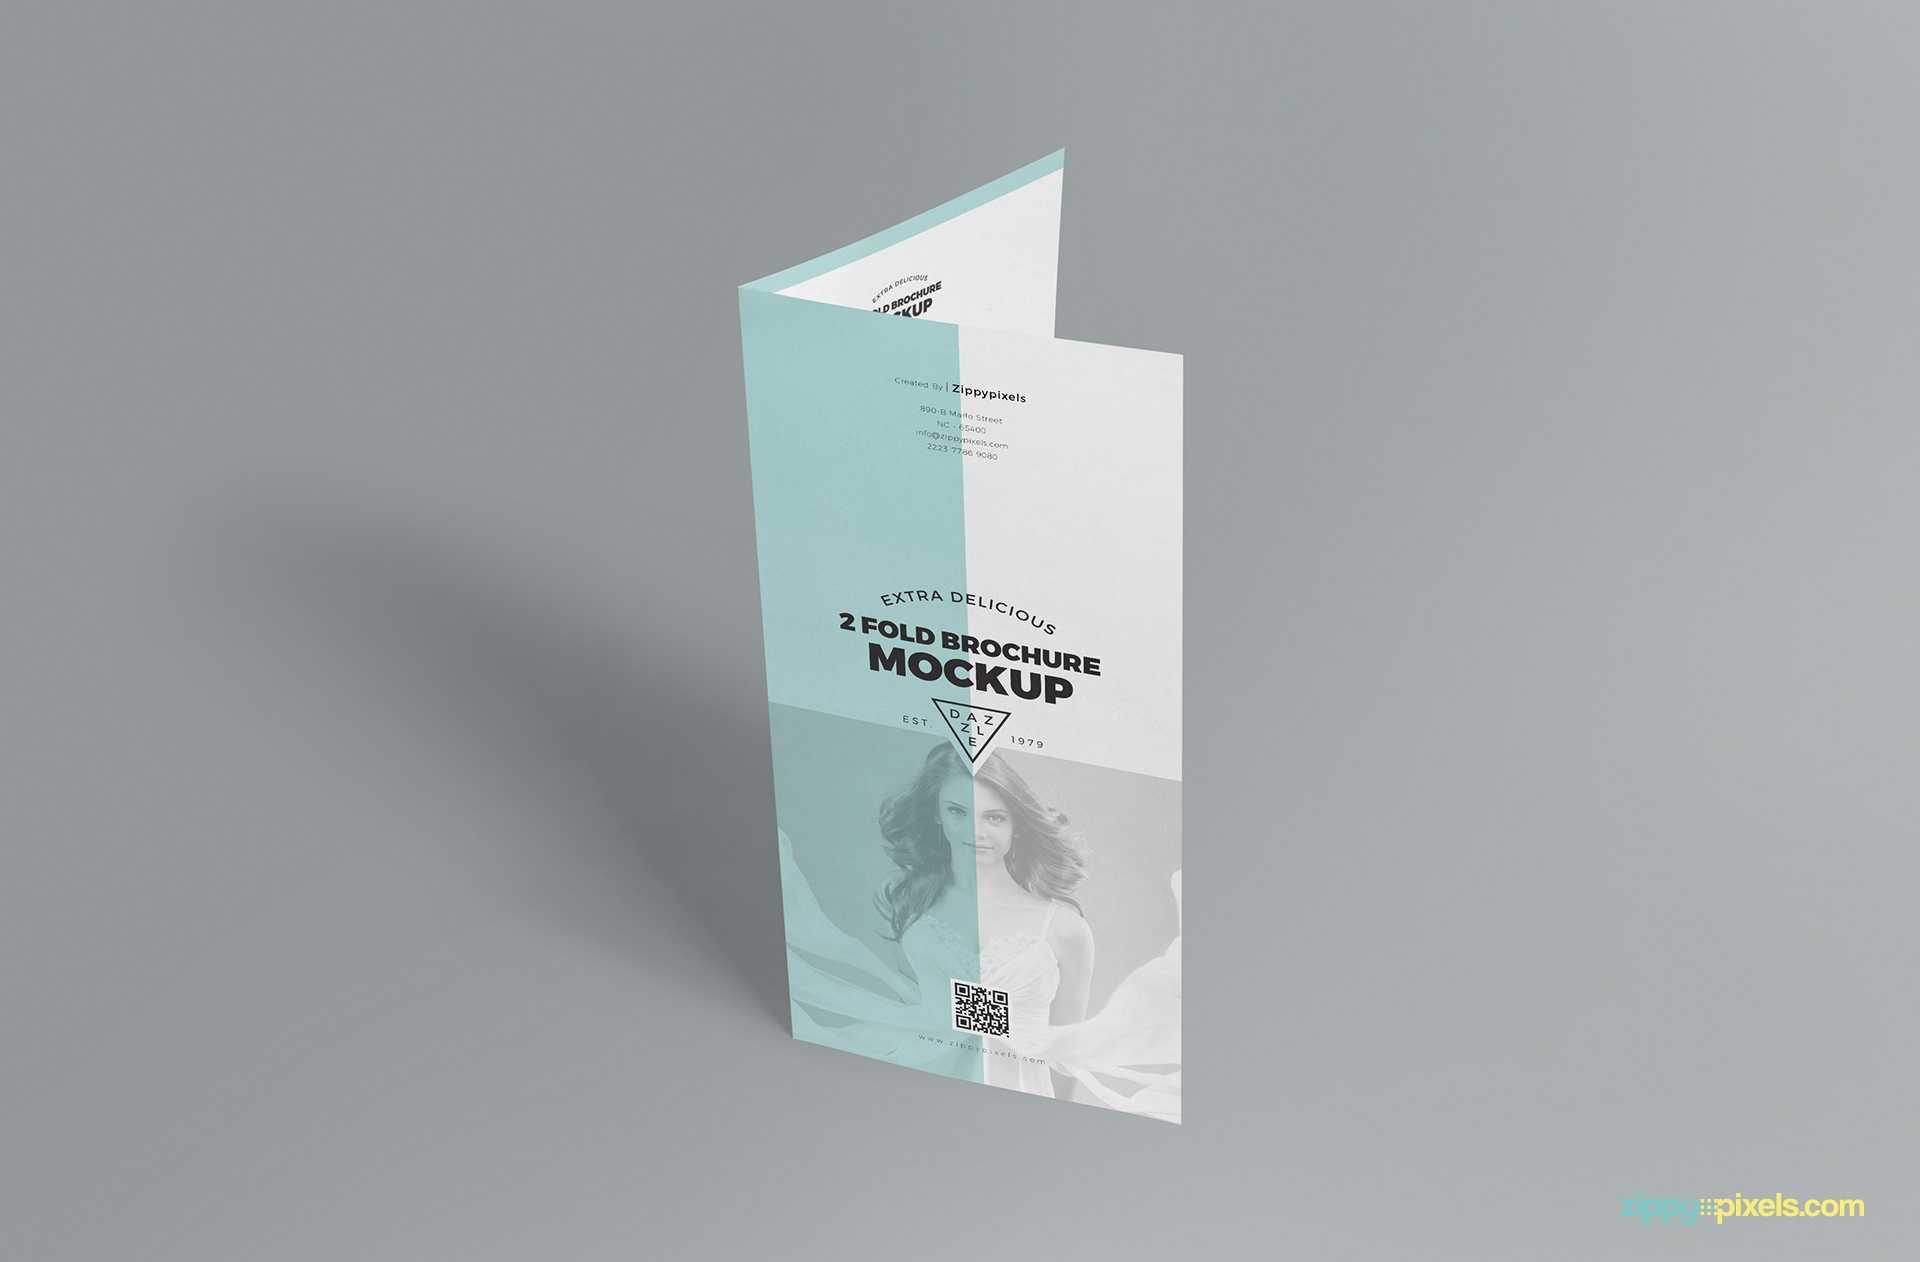 Slick Free 2 Fold Brochure Mockup Psd | Zippypixels inside 2 Fold Brochure Template Free